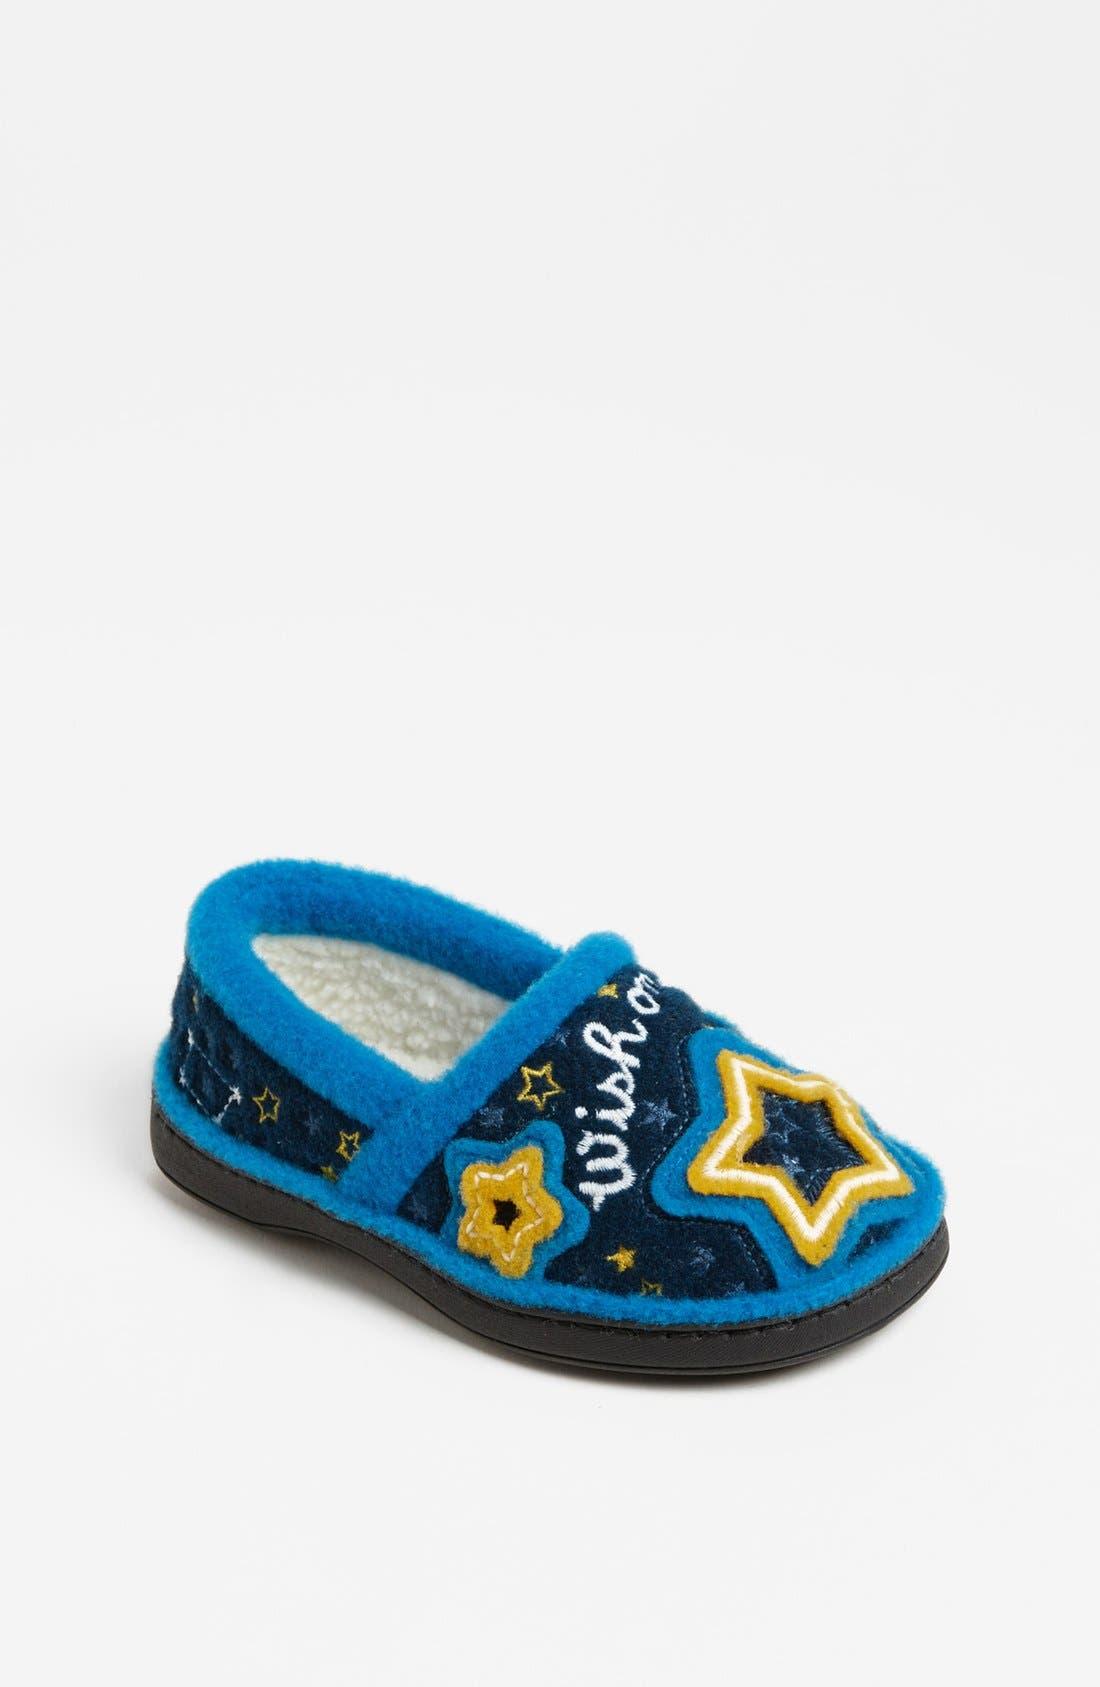 Main Image - Acorn 'Glow Star' Slipper (Toddler, Little Kid & Big Kid)